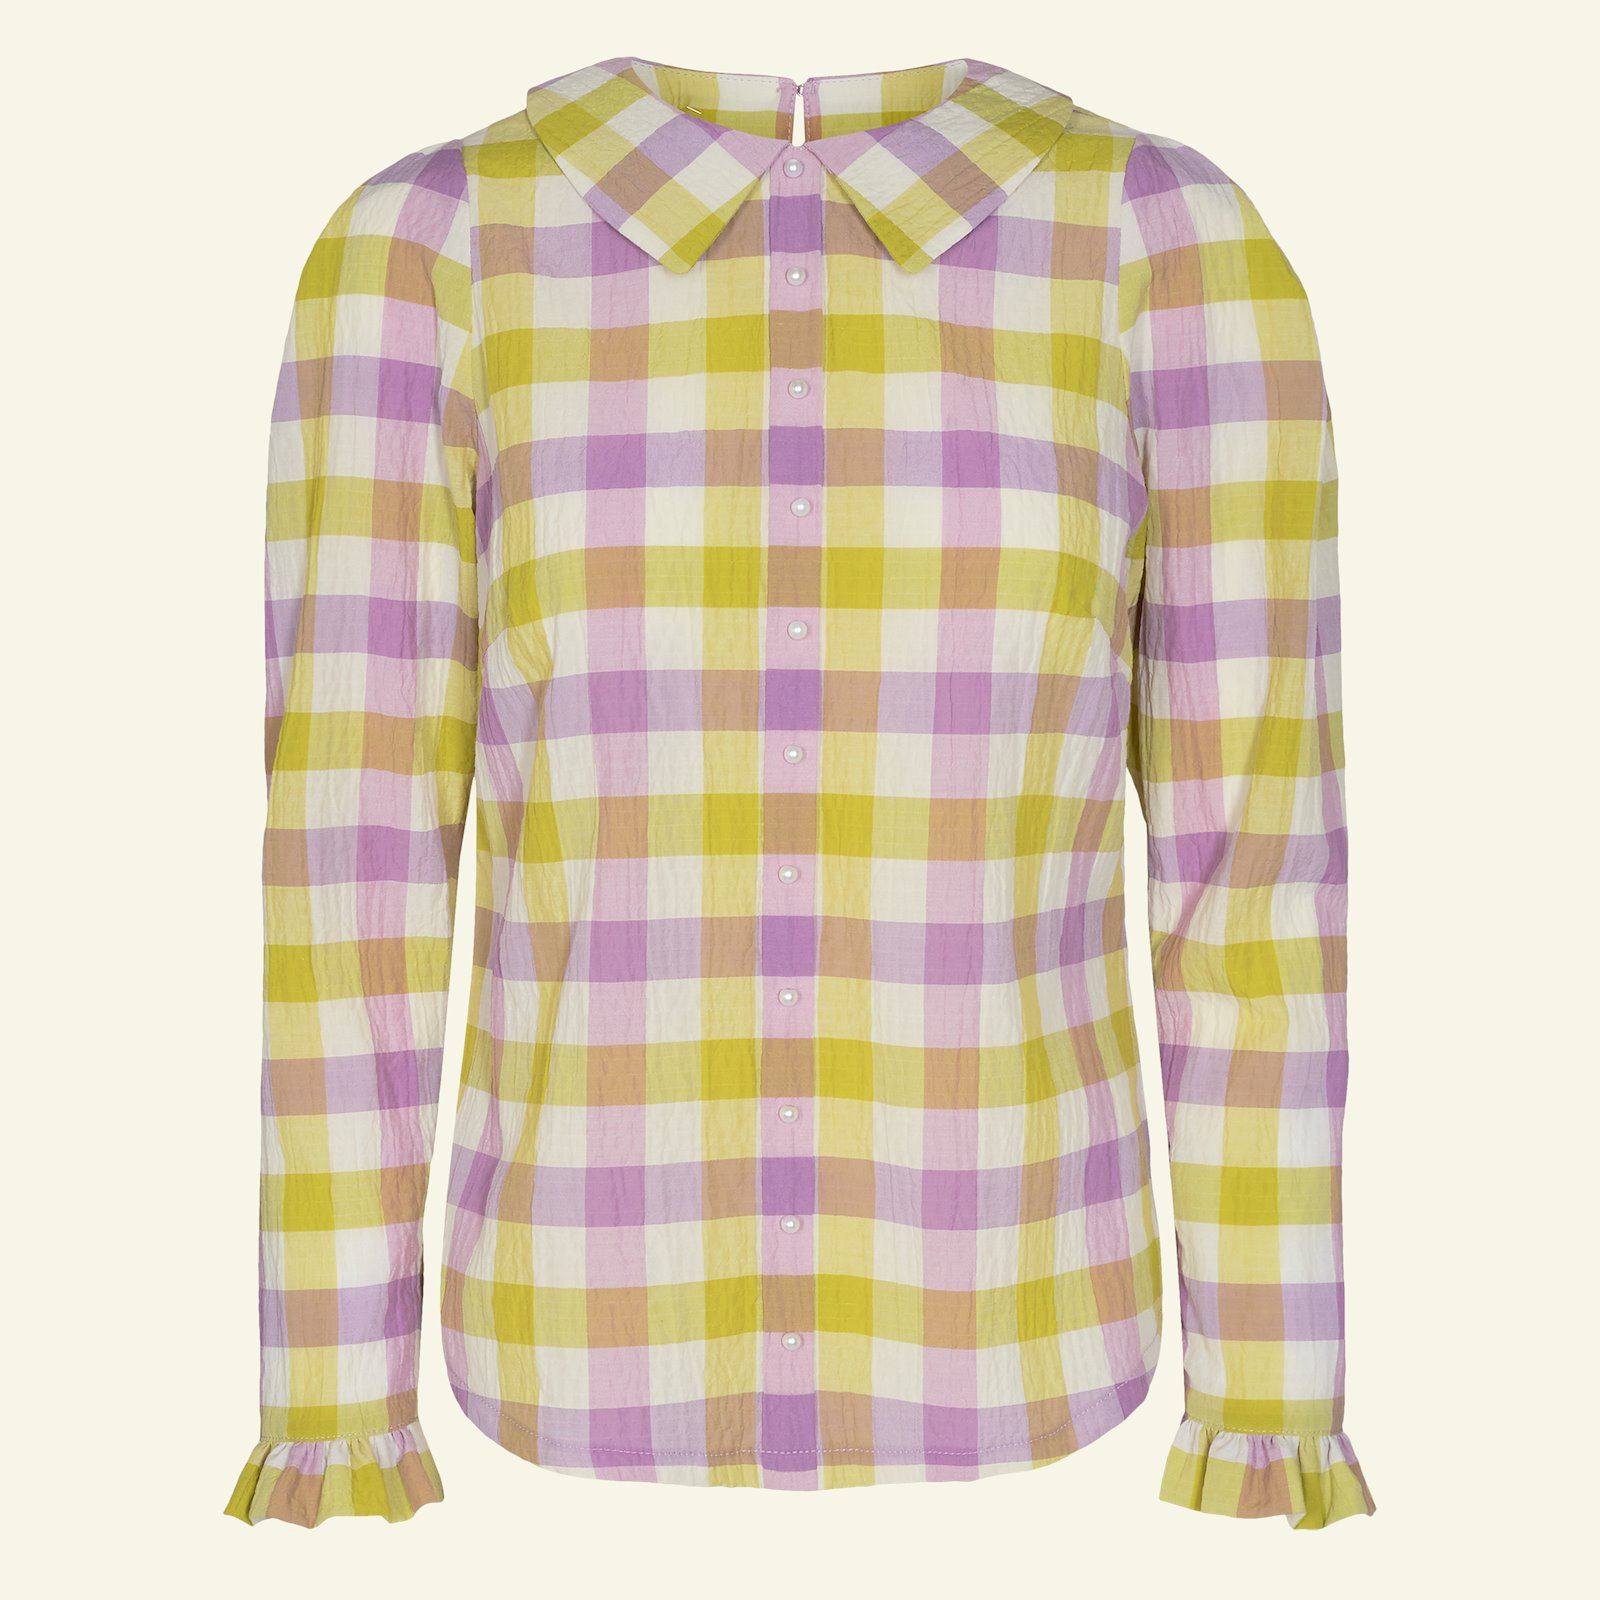 Design your own blouse, 44/16 p22075_580055_40551_sskit